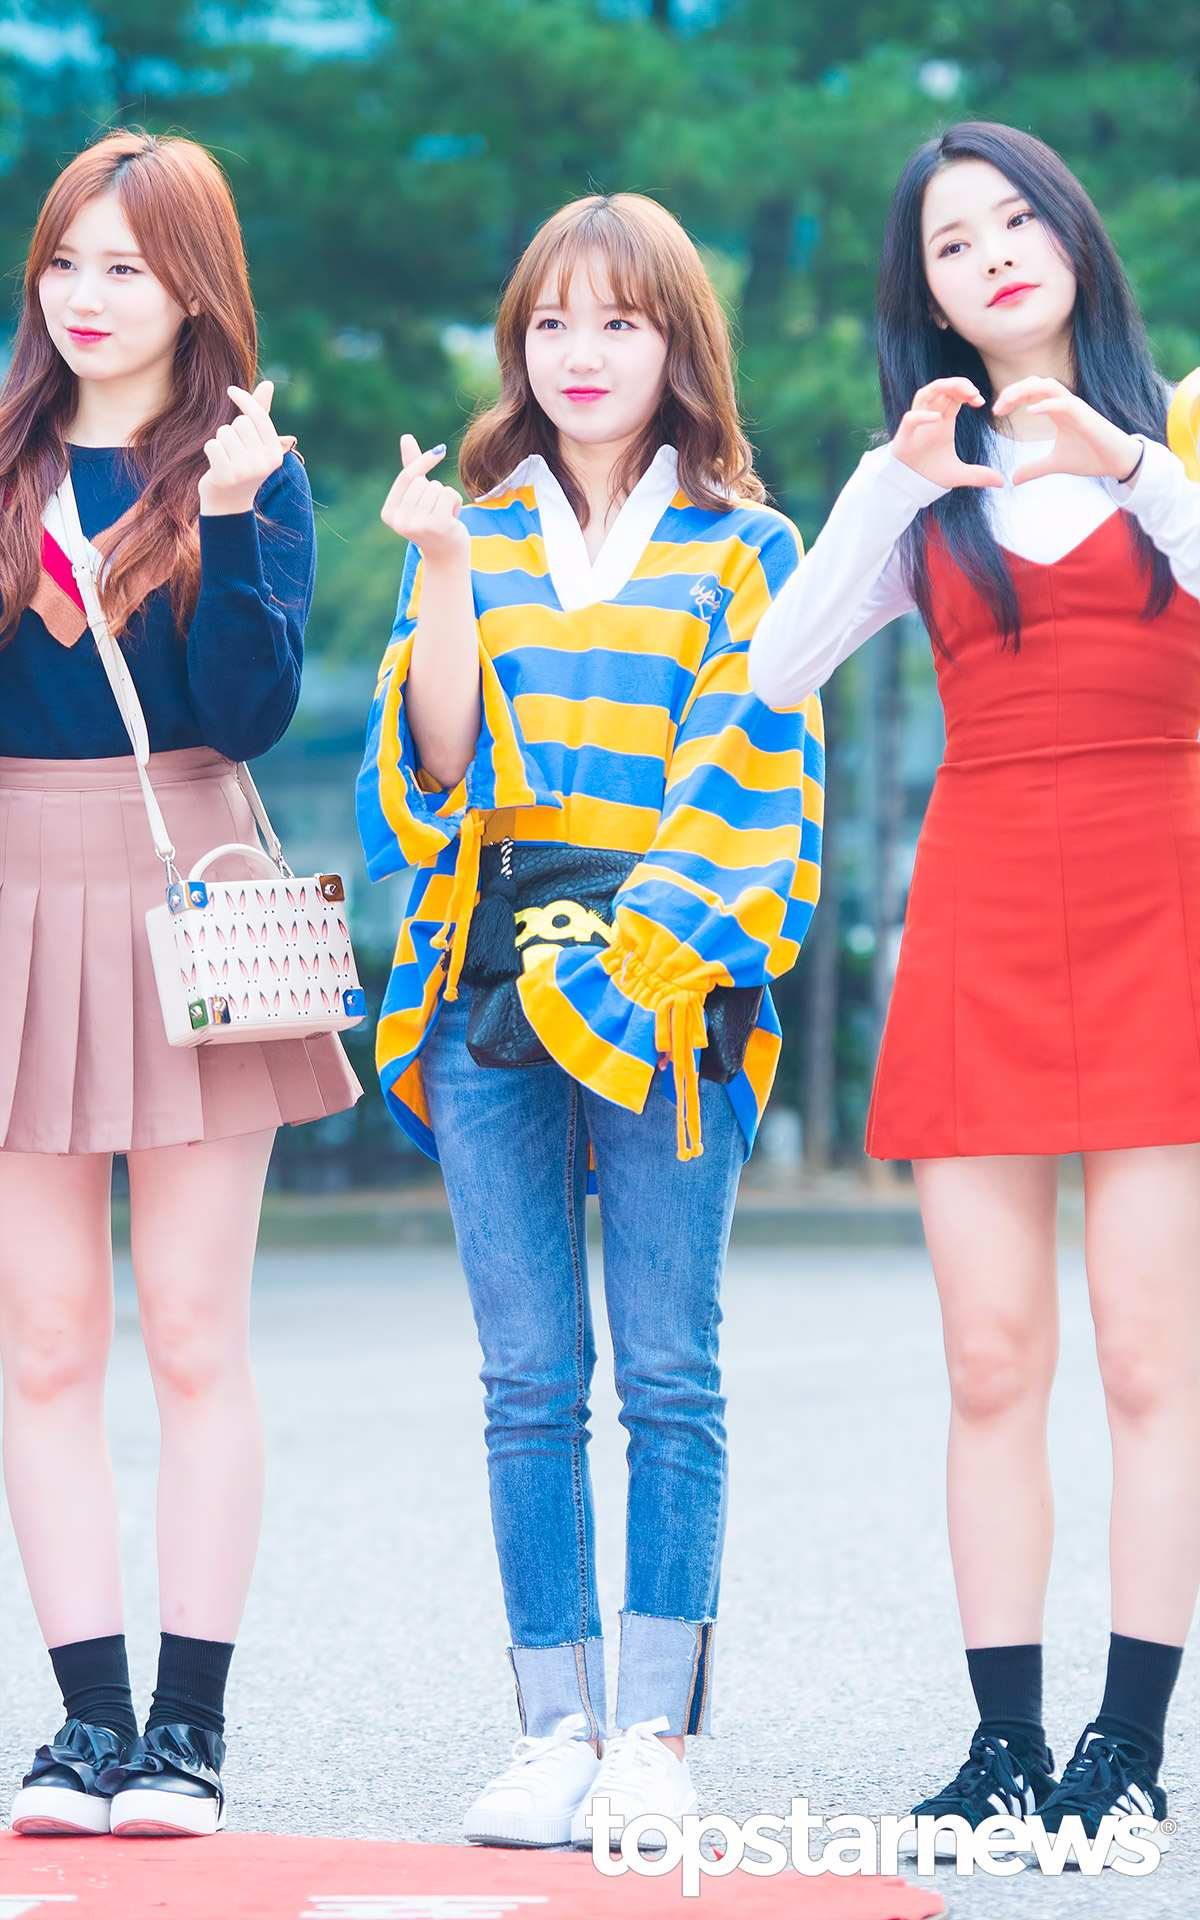 ►Weiki Meki-有情 喜歡簡單、寬鬆的女孩,就來參考看看有情的穿搭吧!利用顯眼的黃藍配色增添青春感,以上寬下窄的搭配訣竅讓自己看起來更顯瘦!最特別的就是在於上衣的縮袖設計,是非常好藏肉的單品呢!